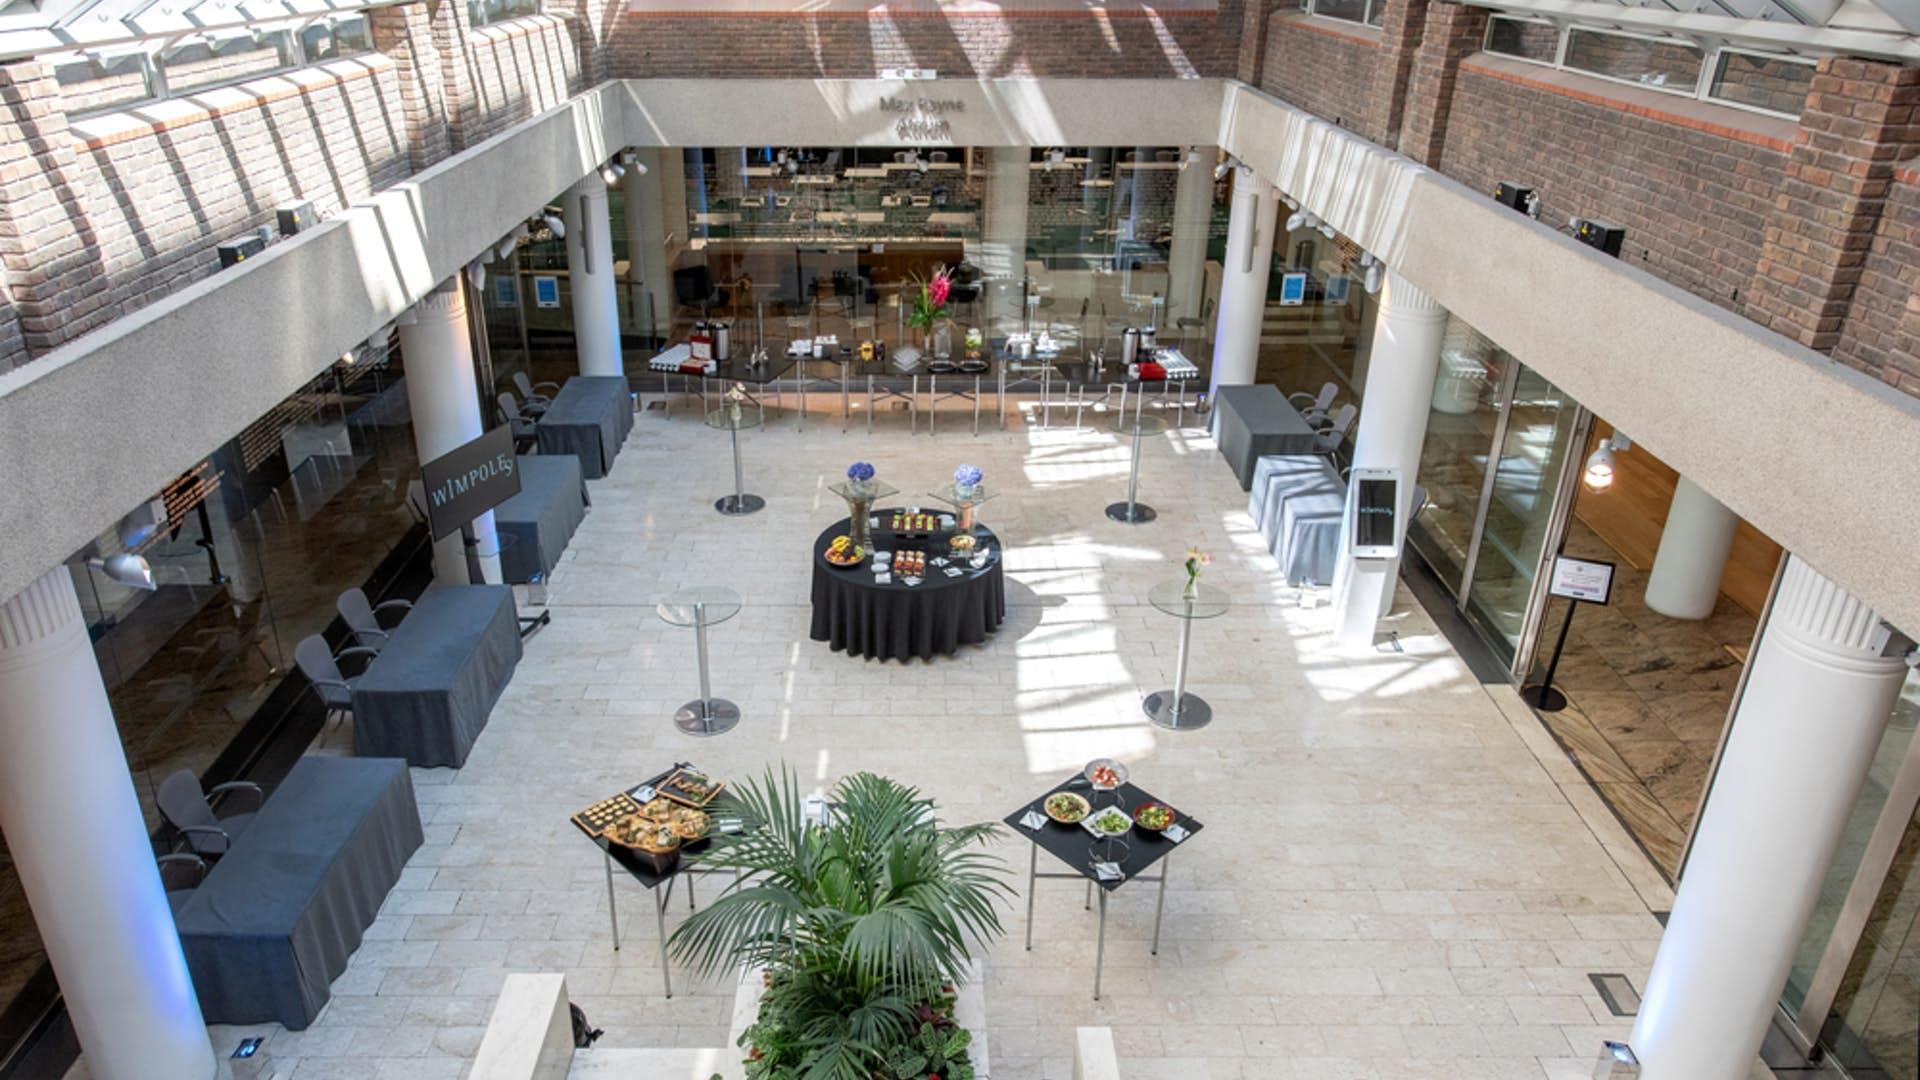 Atrium at 1 Wimpole Street